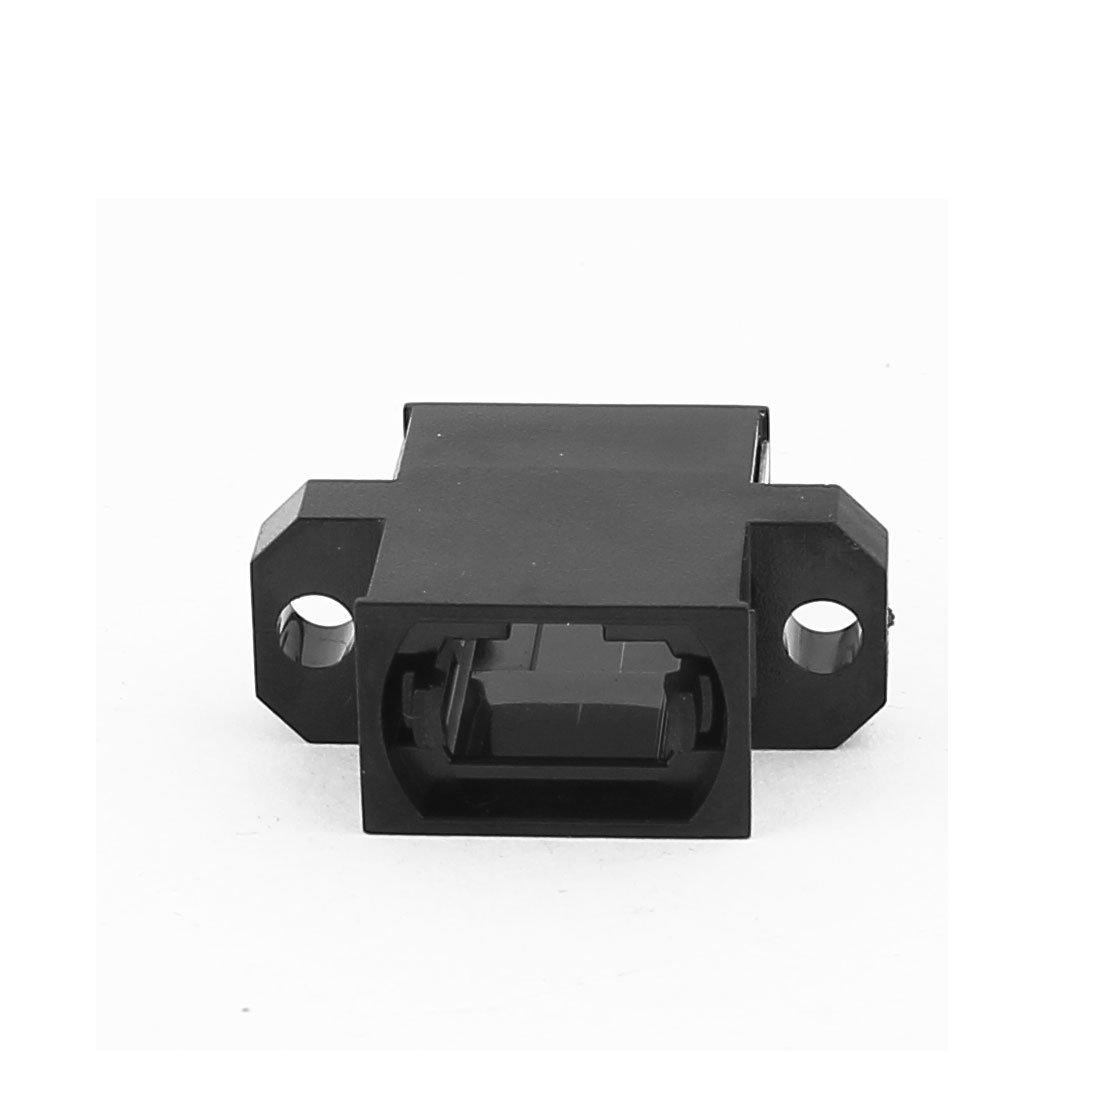 1//8 CS x 1 lb Spool Sterling Seal and Supply Spool 1//8 CS x 1 lb 2002.125x1 2002 Teadit Style Carbon Yarn STCC Graphite Filled